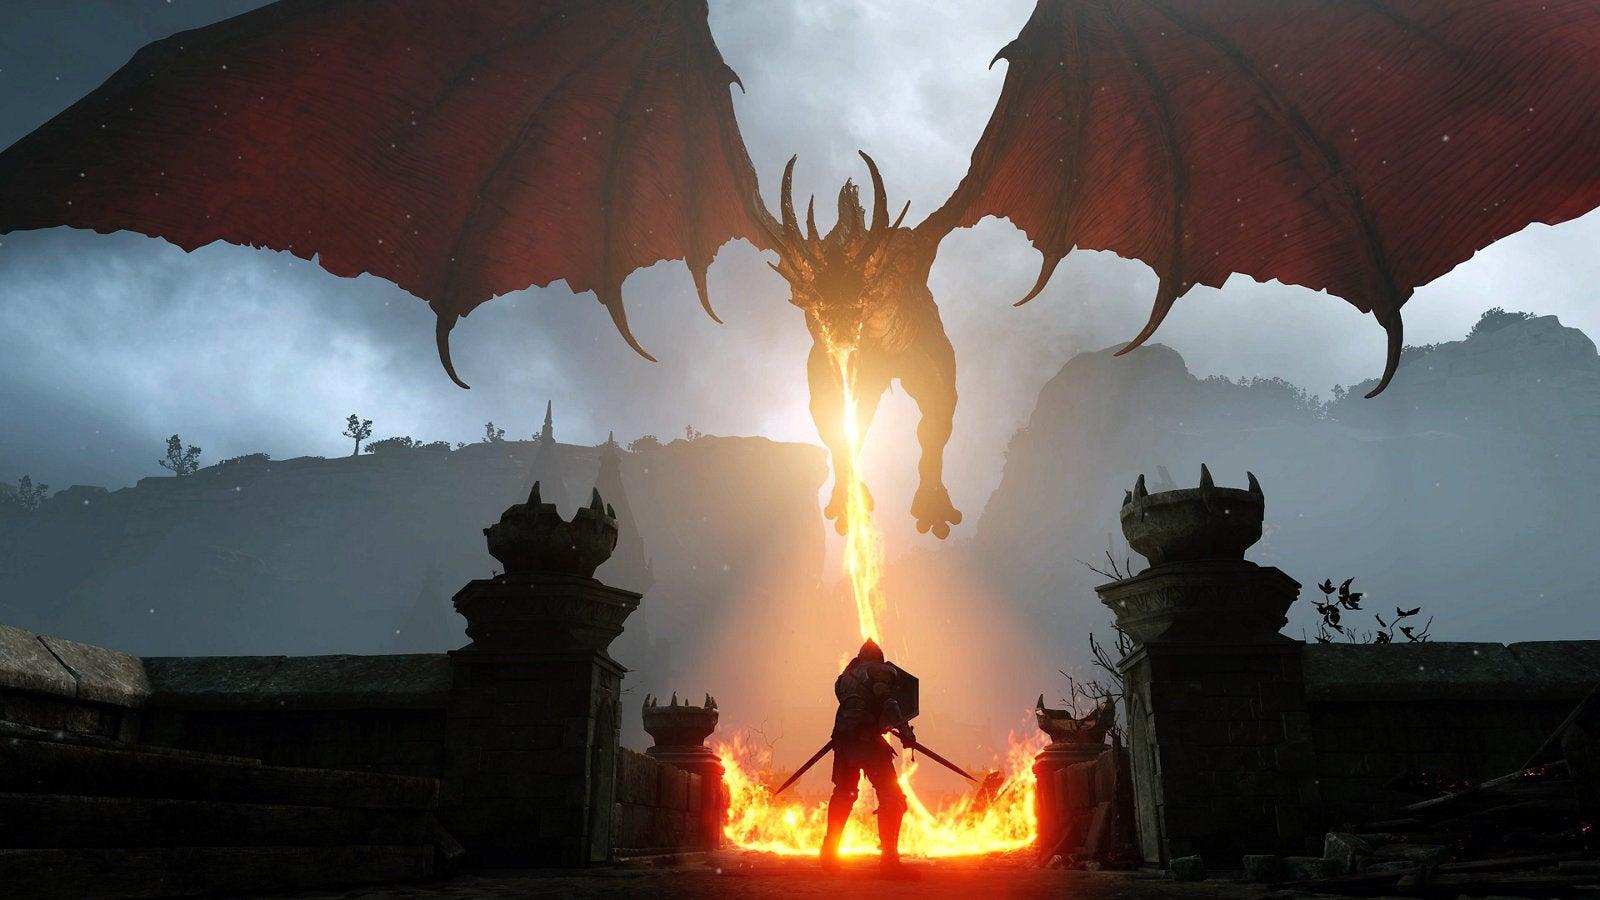 Image for Demon's Souls Digital Deluxe Edition and digital pre-order bonus announced